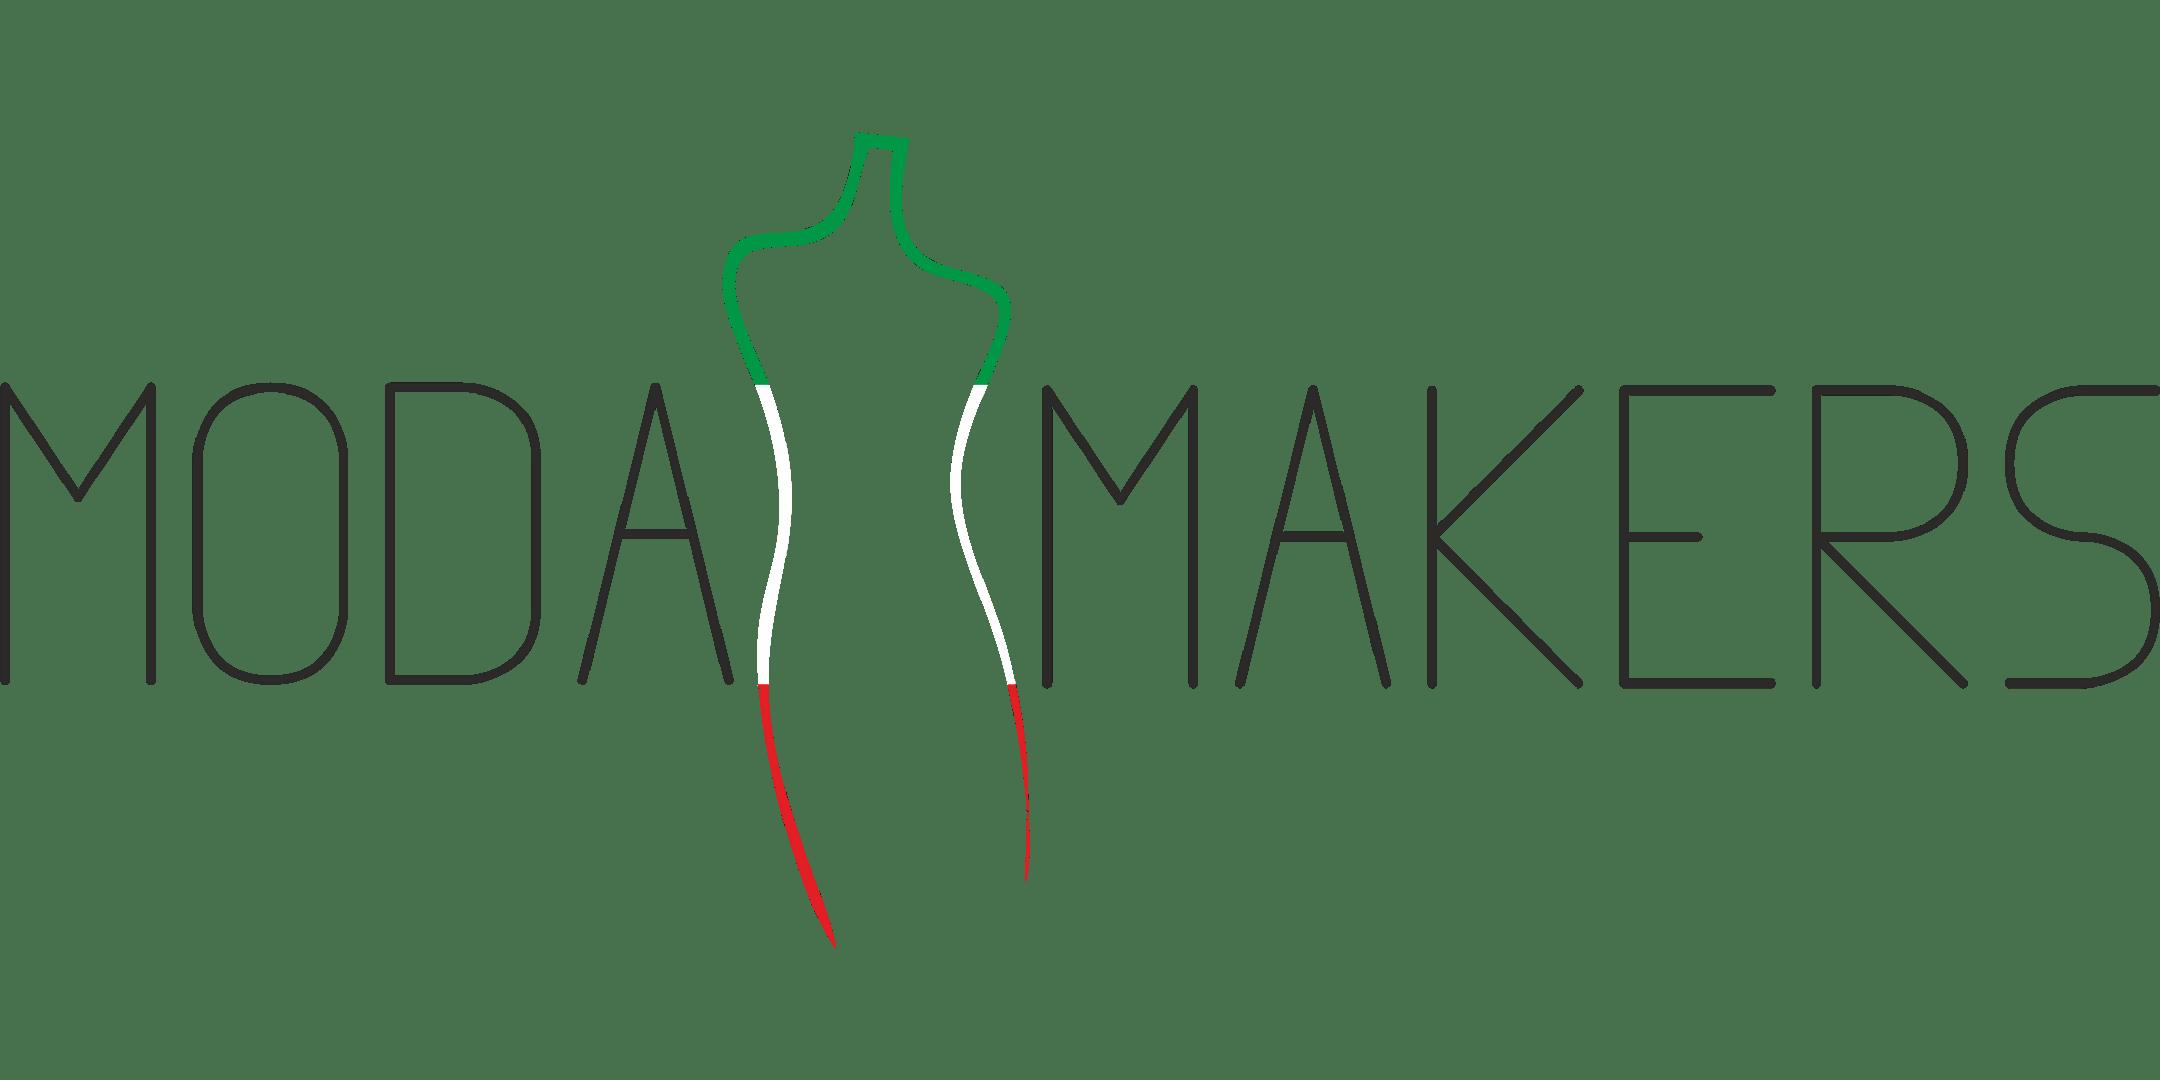 Moda Makers